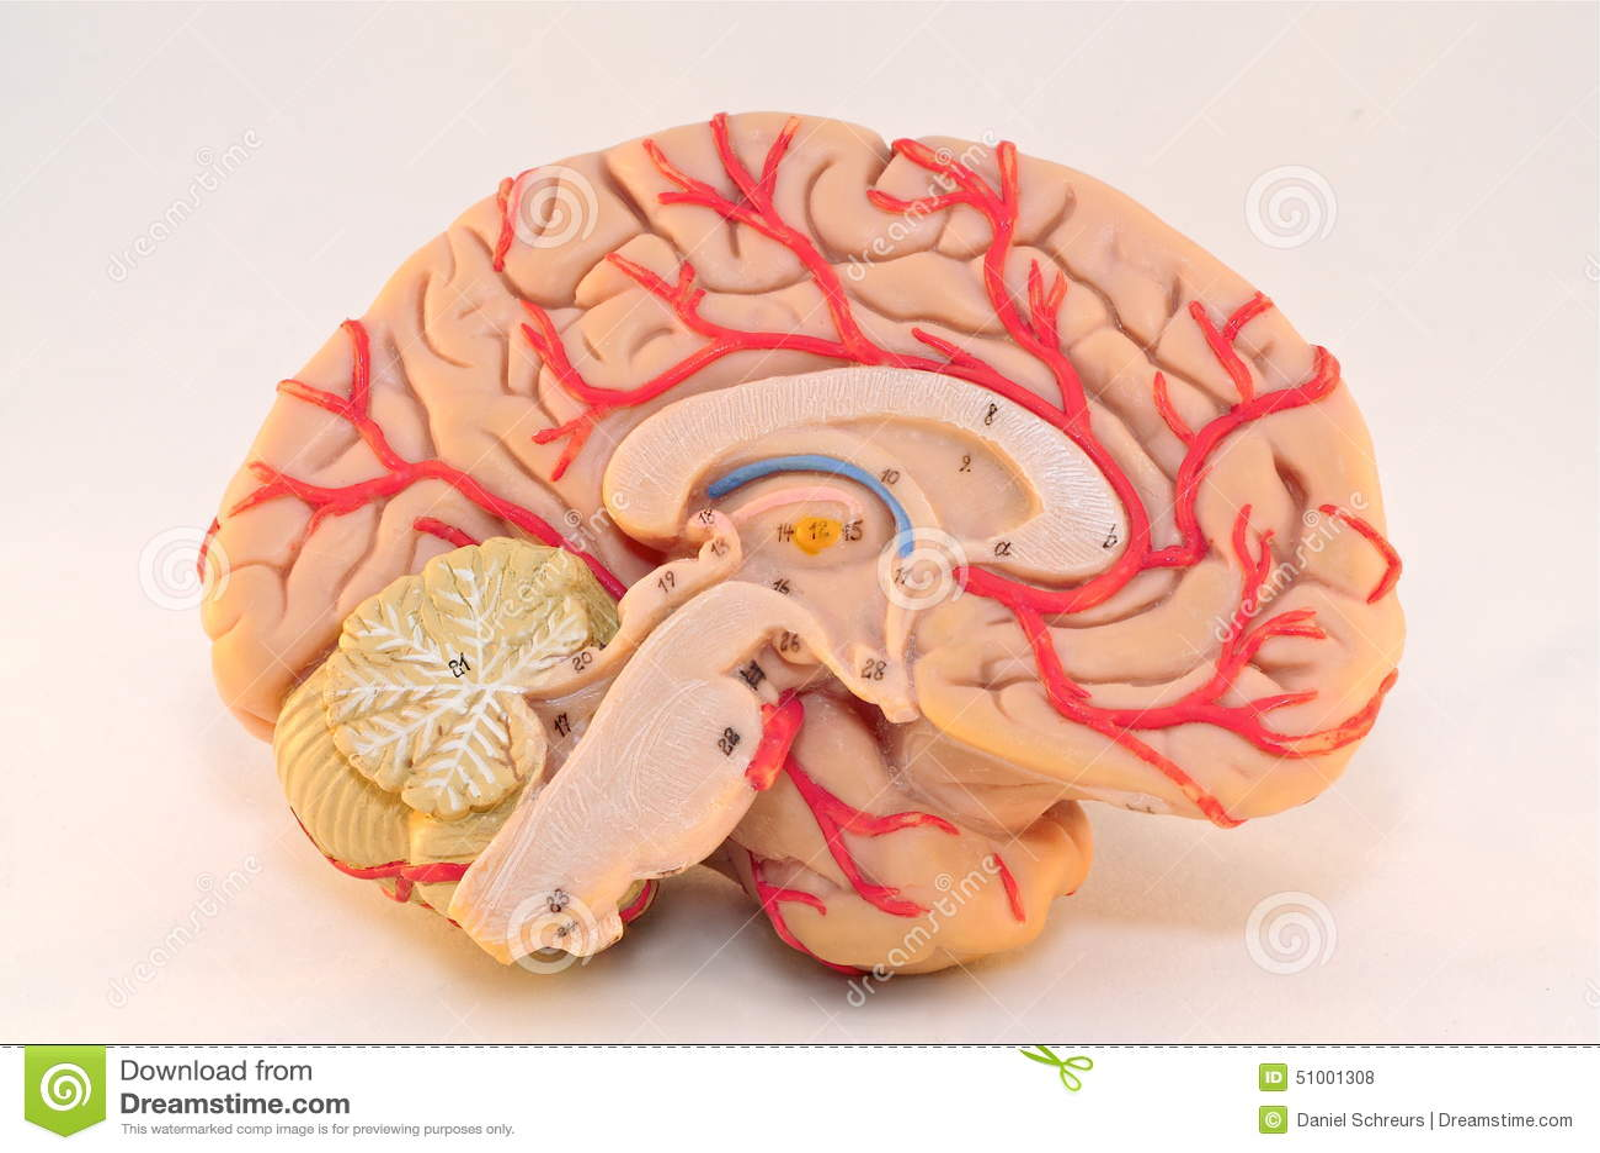 Human Cerebral Hemisphere Anatomy Model (Medial View) Stock Photo ...